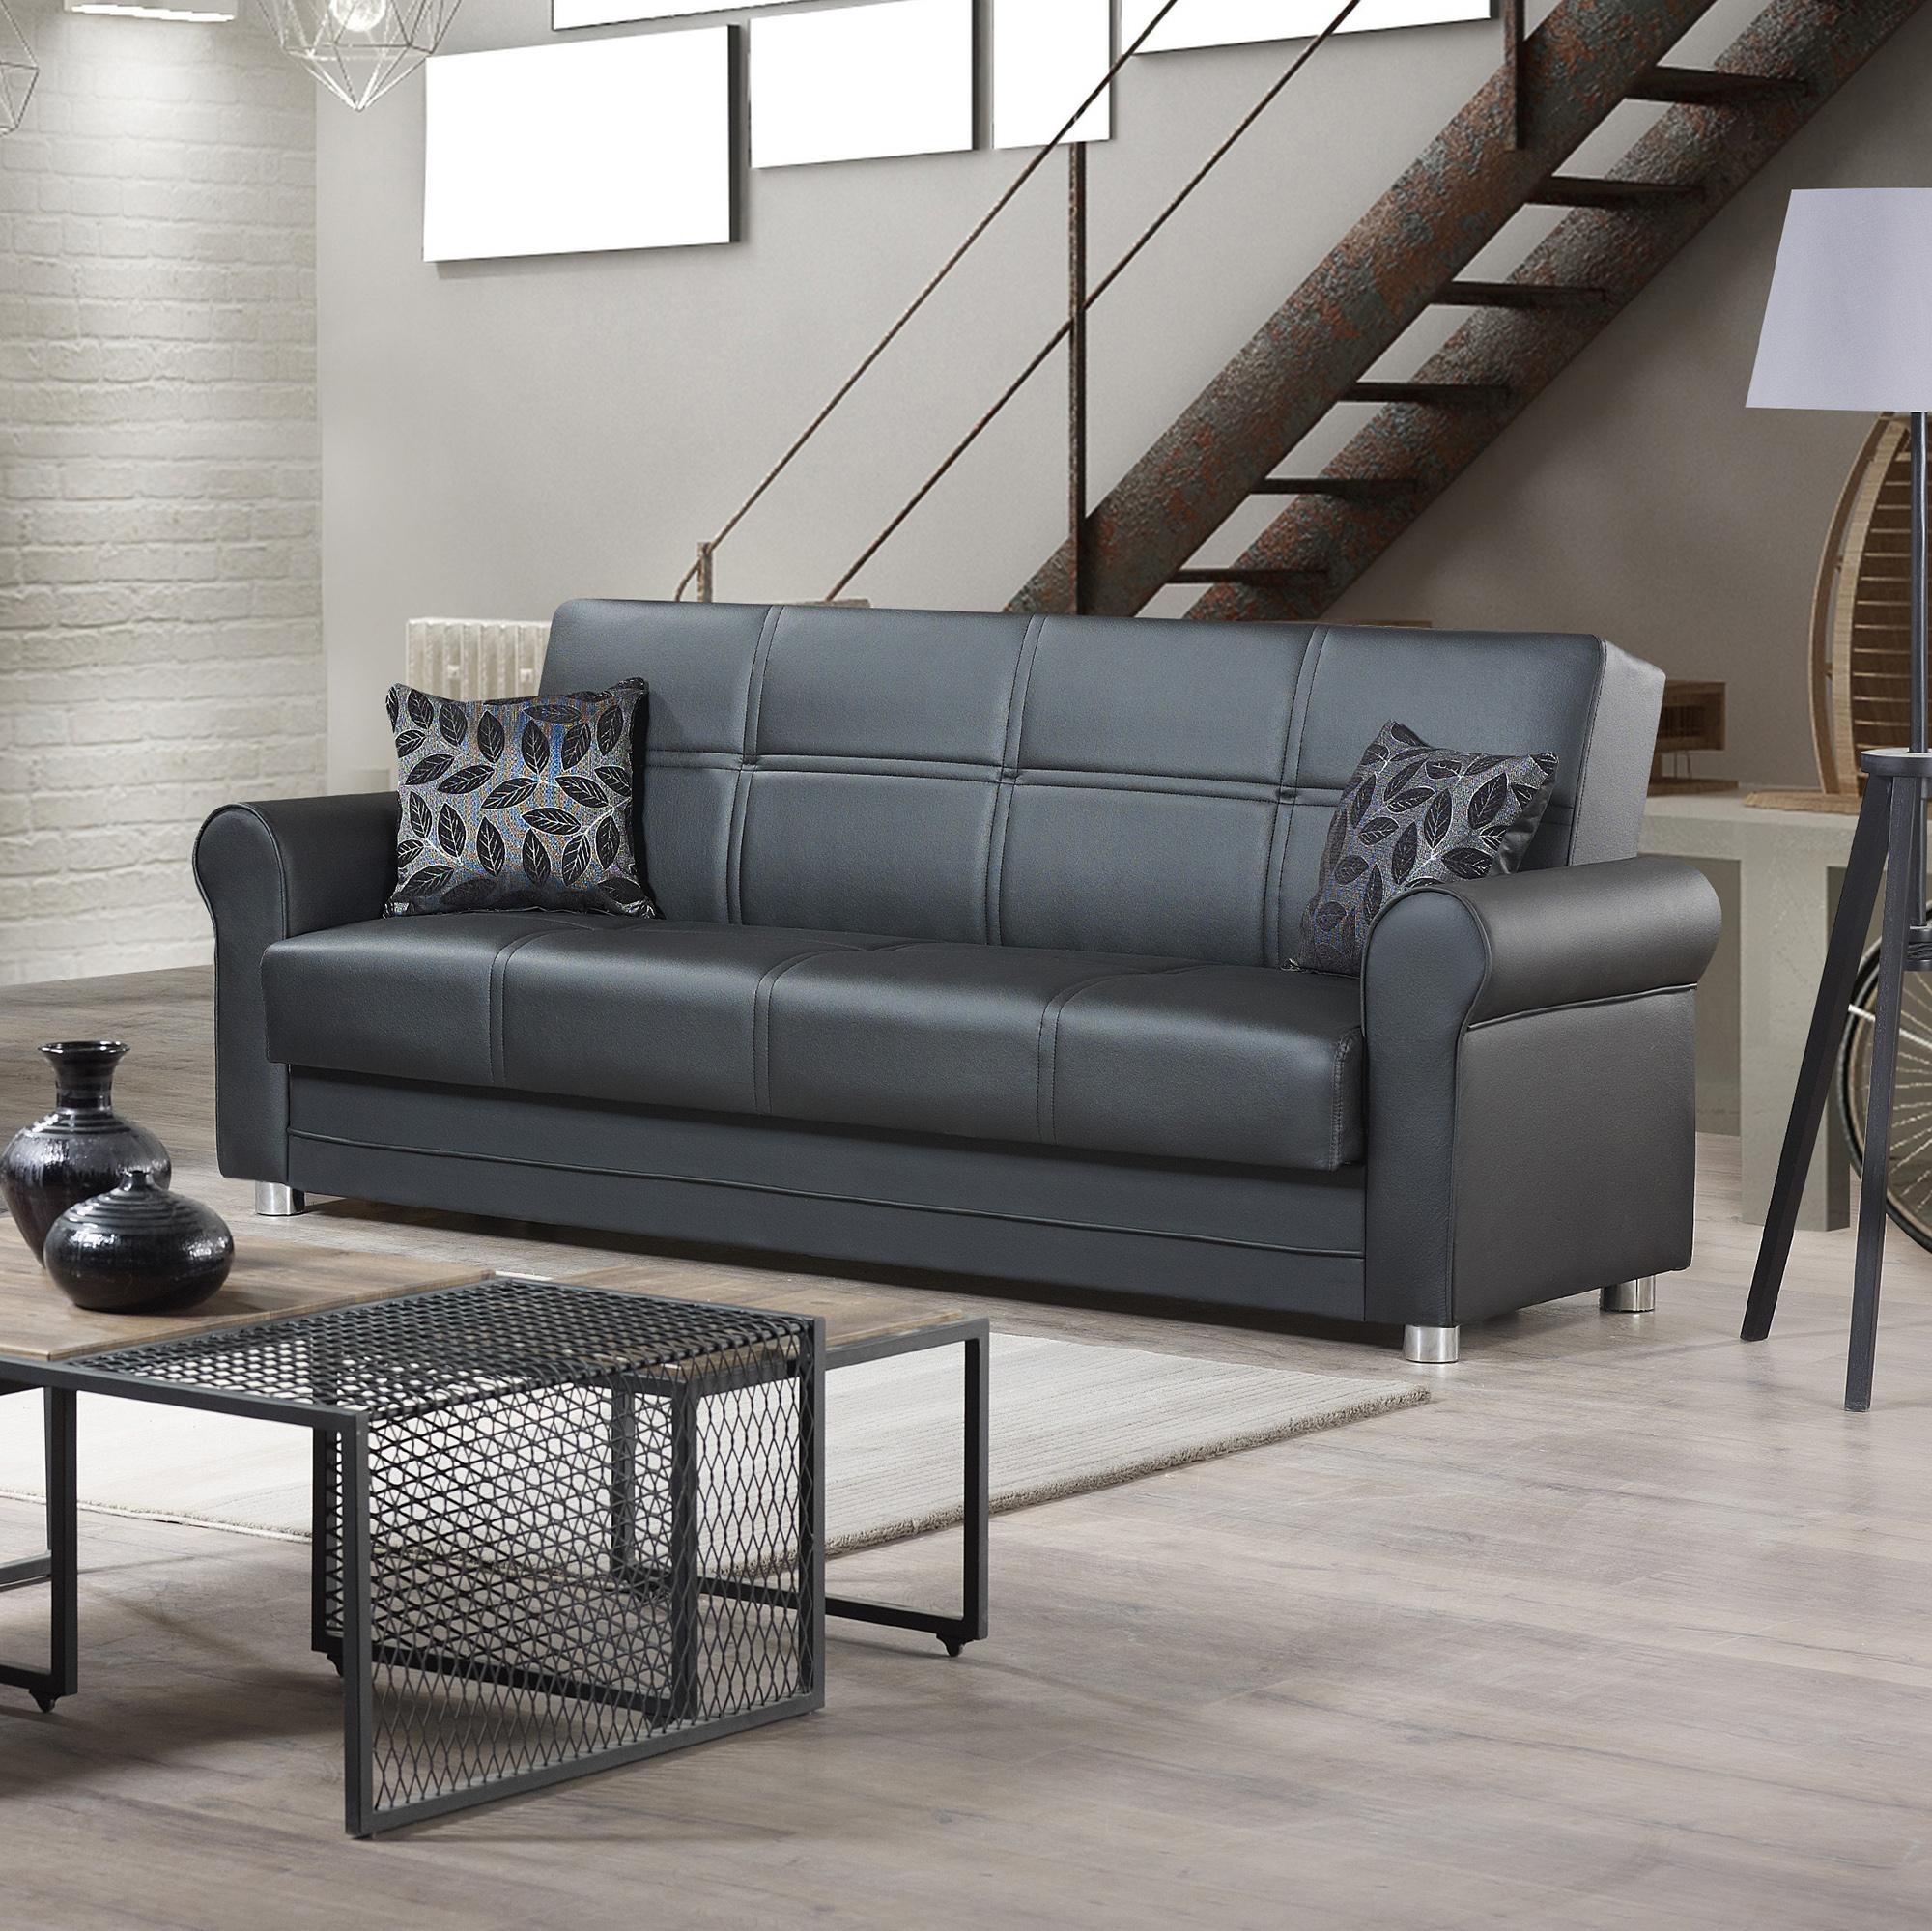 Ottomanson Avalon Sofa Bed With Storage In Leather With Regard To Prato Storage Sectional Futon Sofas (View 2 of 15)